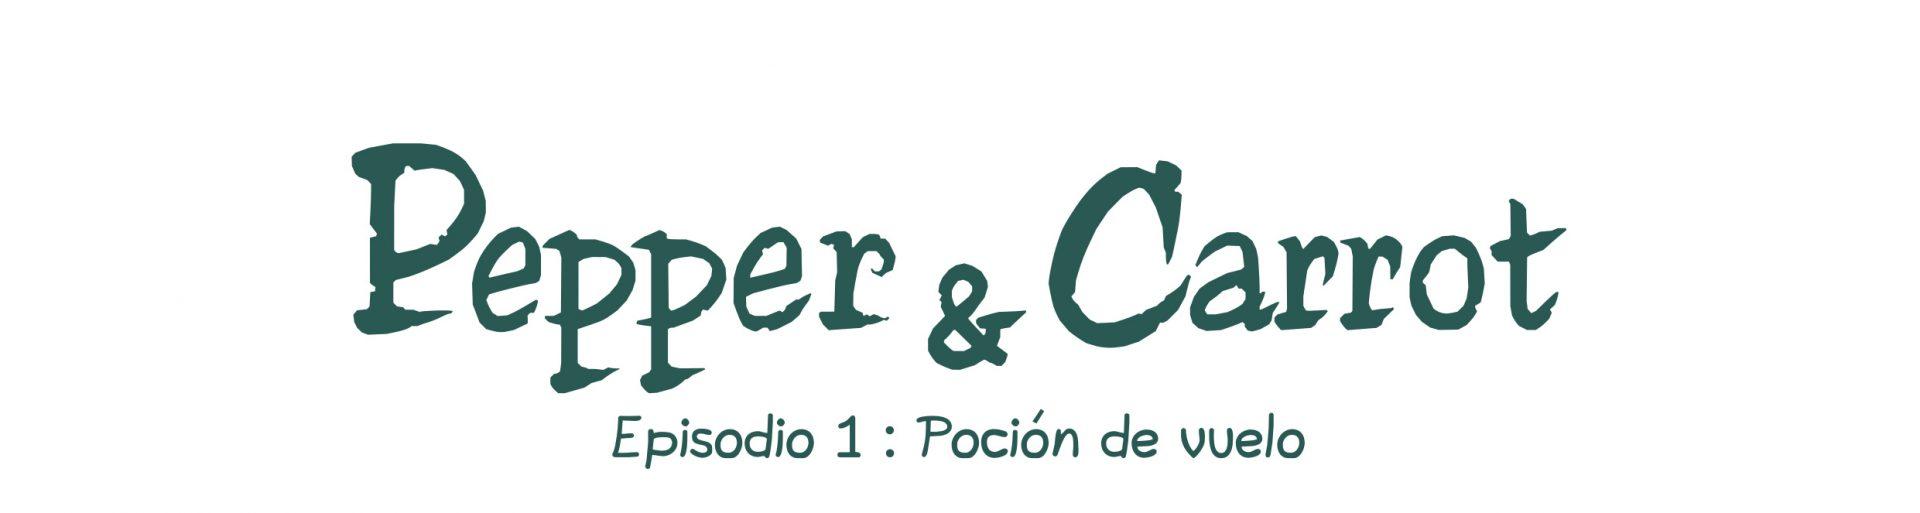 Pepper_Carrot_esp_01_000